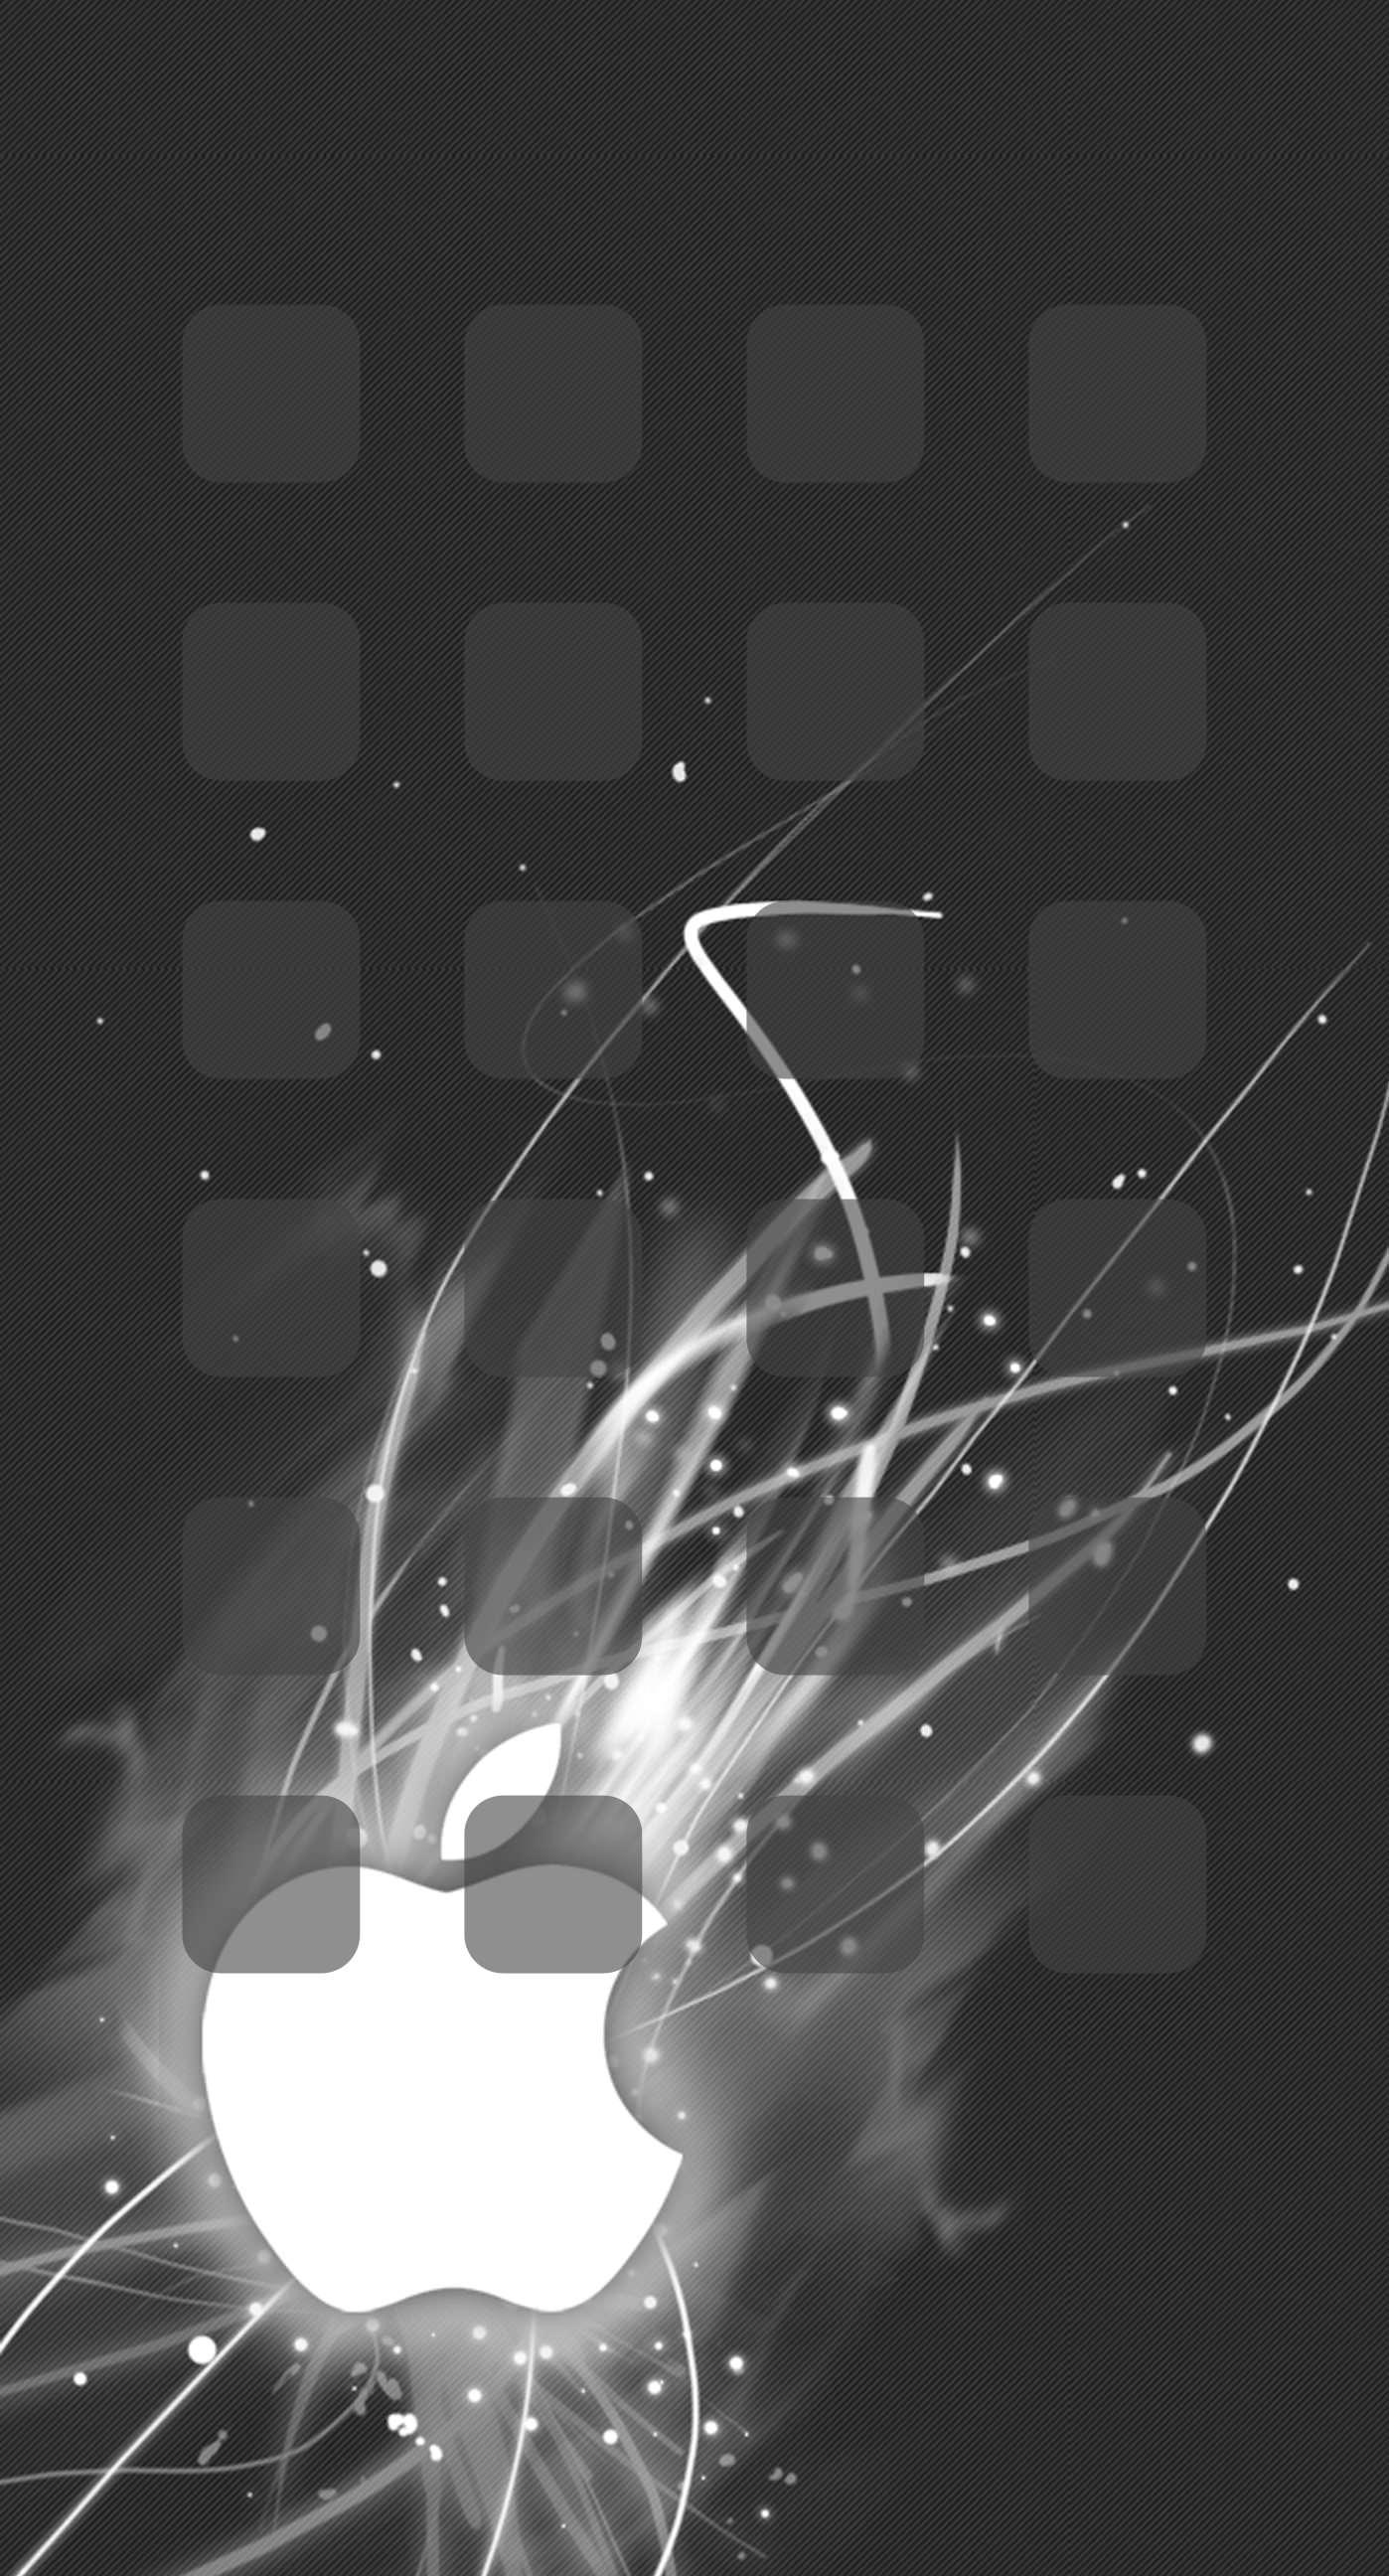 apple logo shelf cool black iphone6splus.